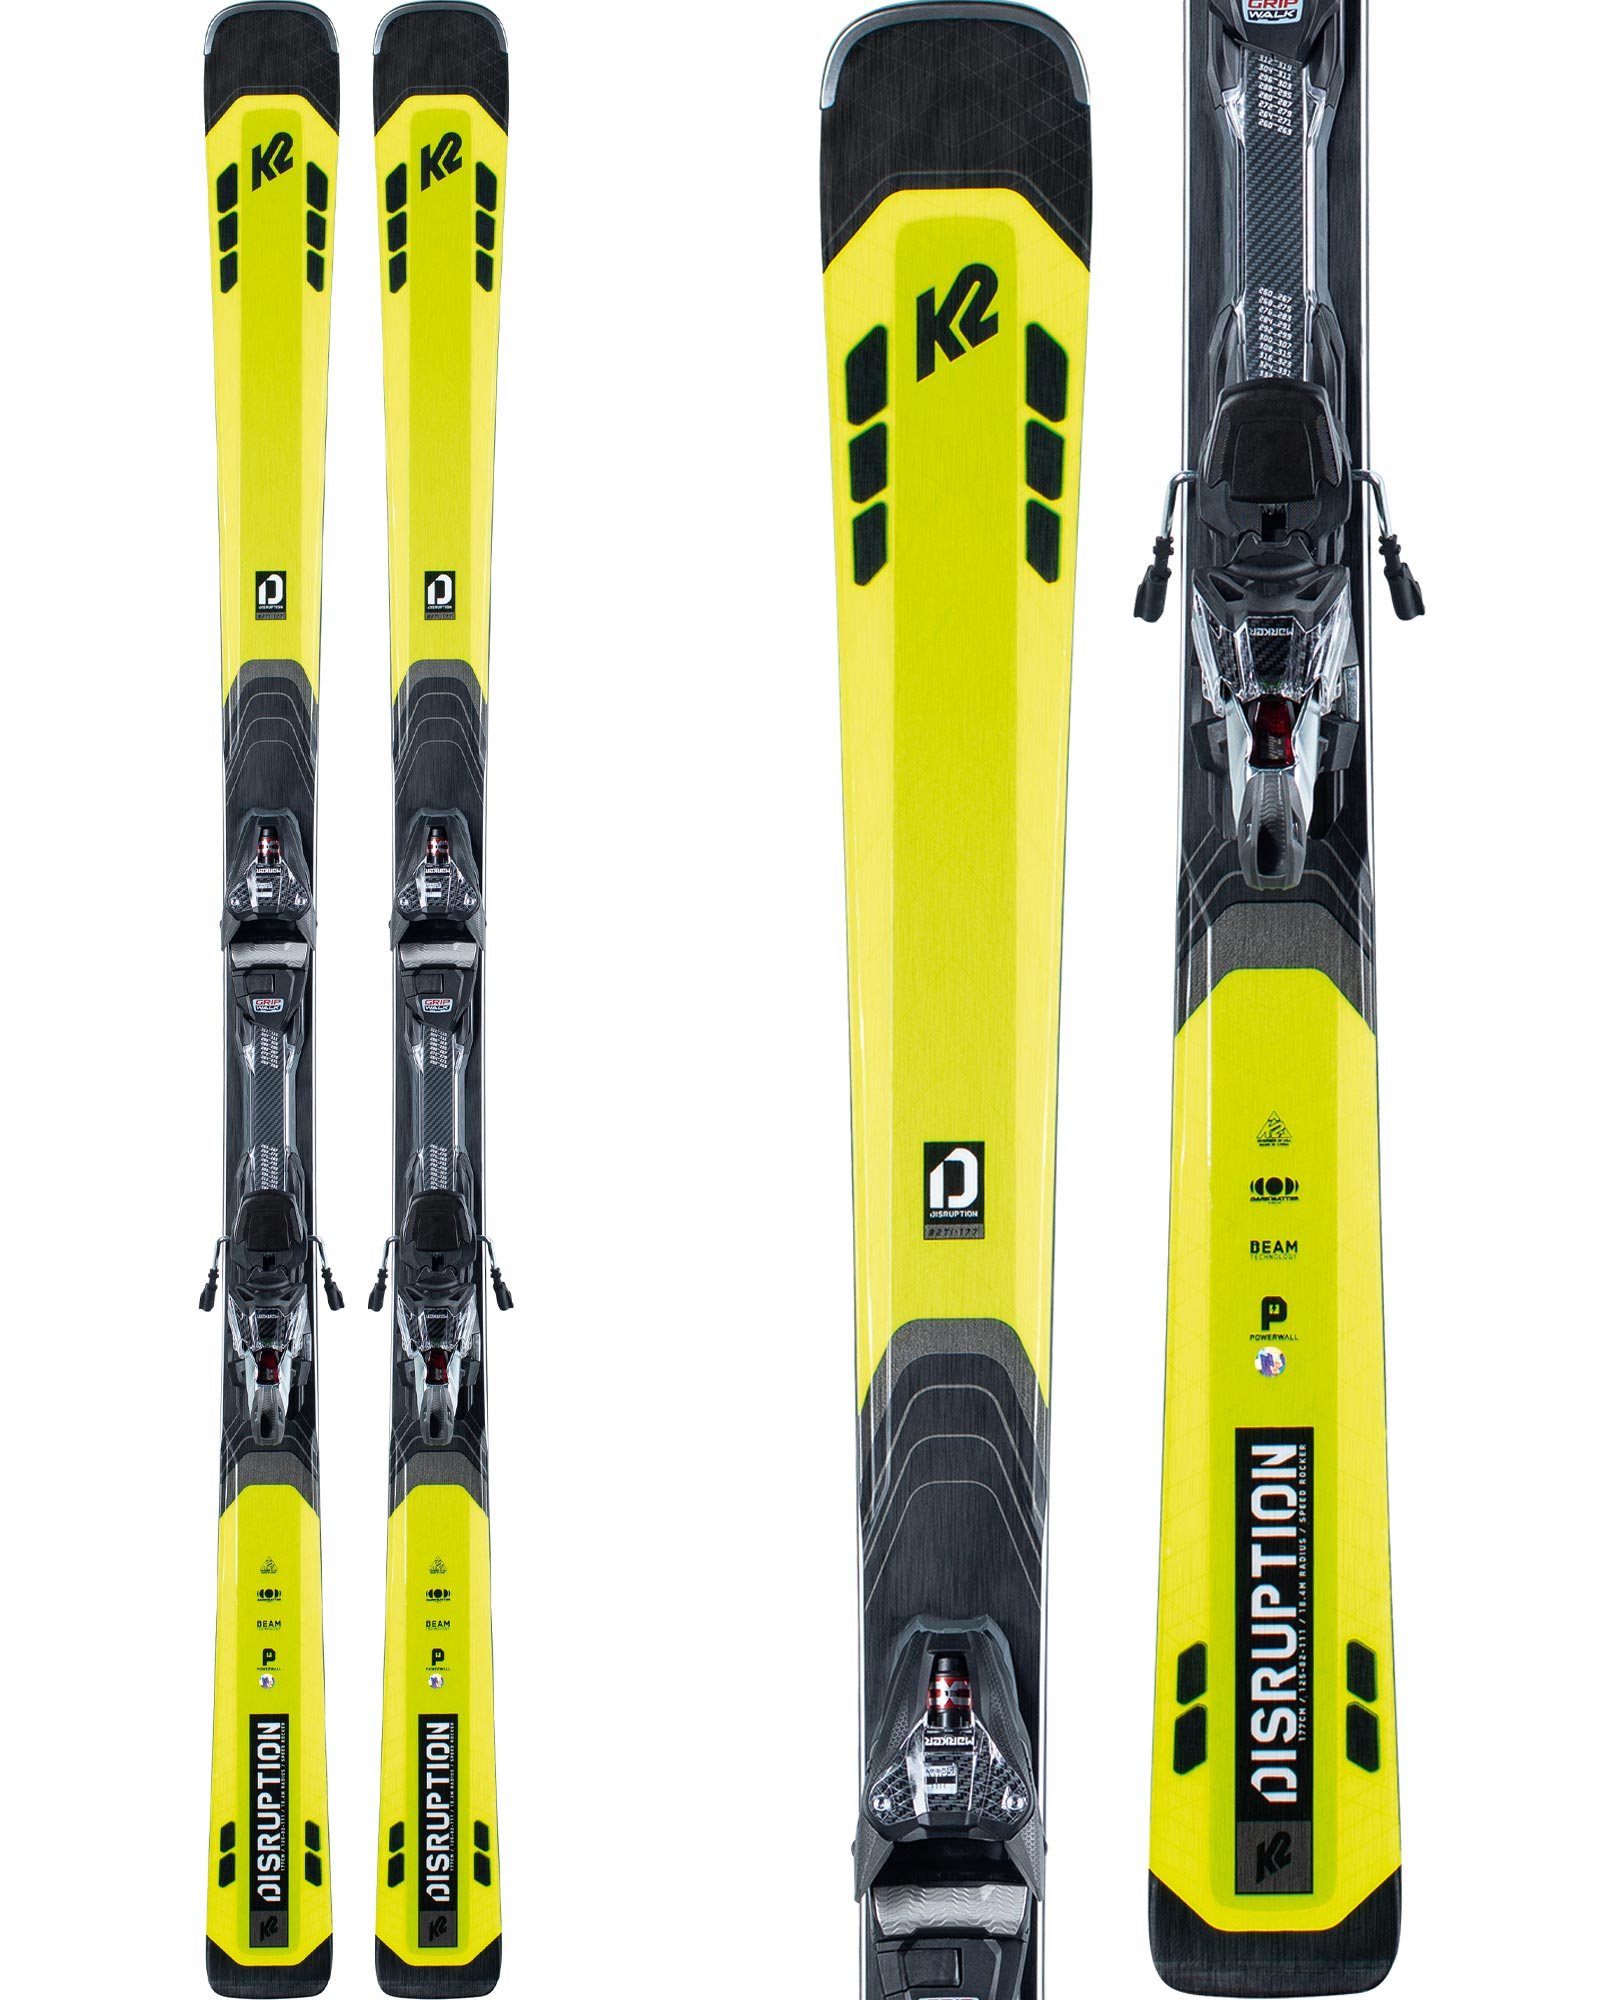 K2 Men's Disruption 82 Ti Piste Skis + MXCELL 12 TCx Quiklik Bindings 2020 / 2021 0